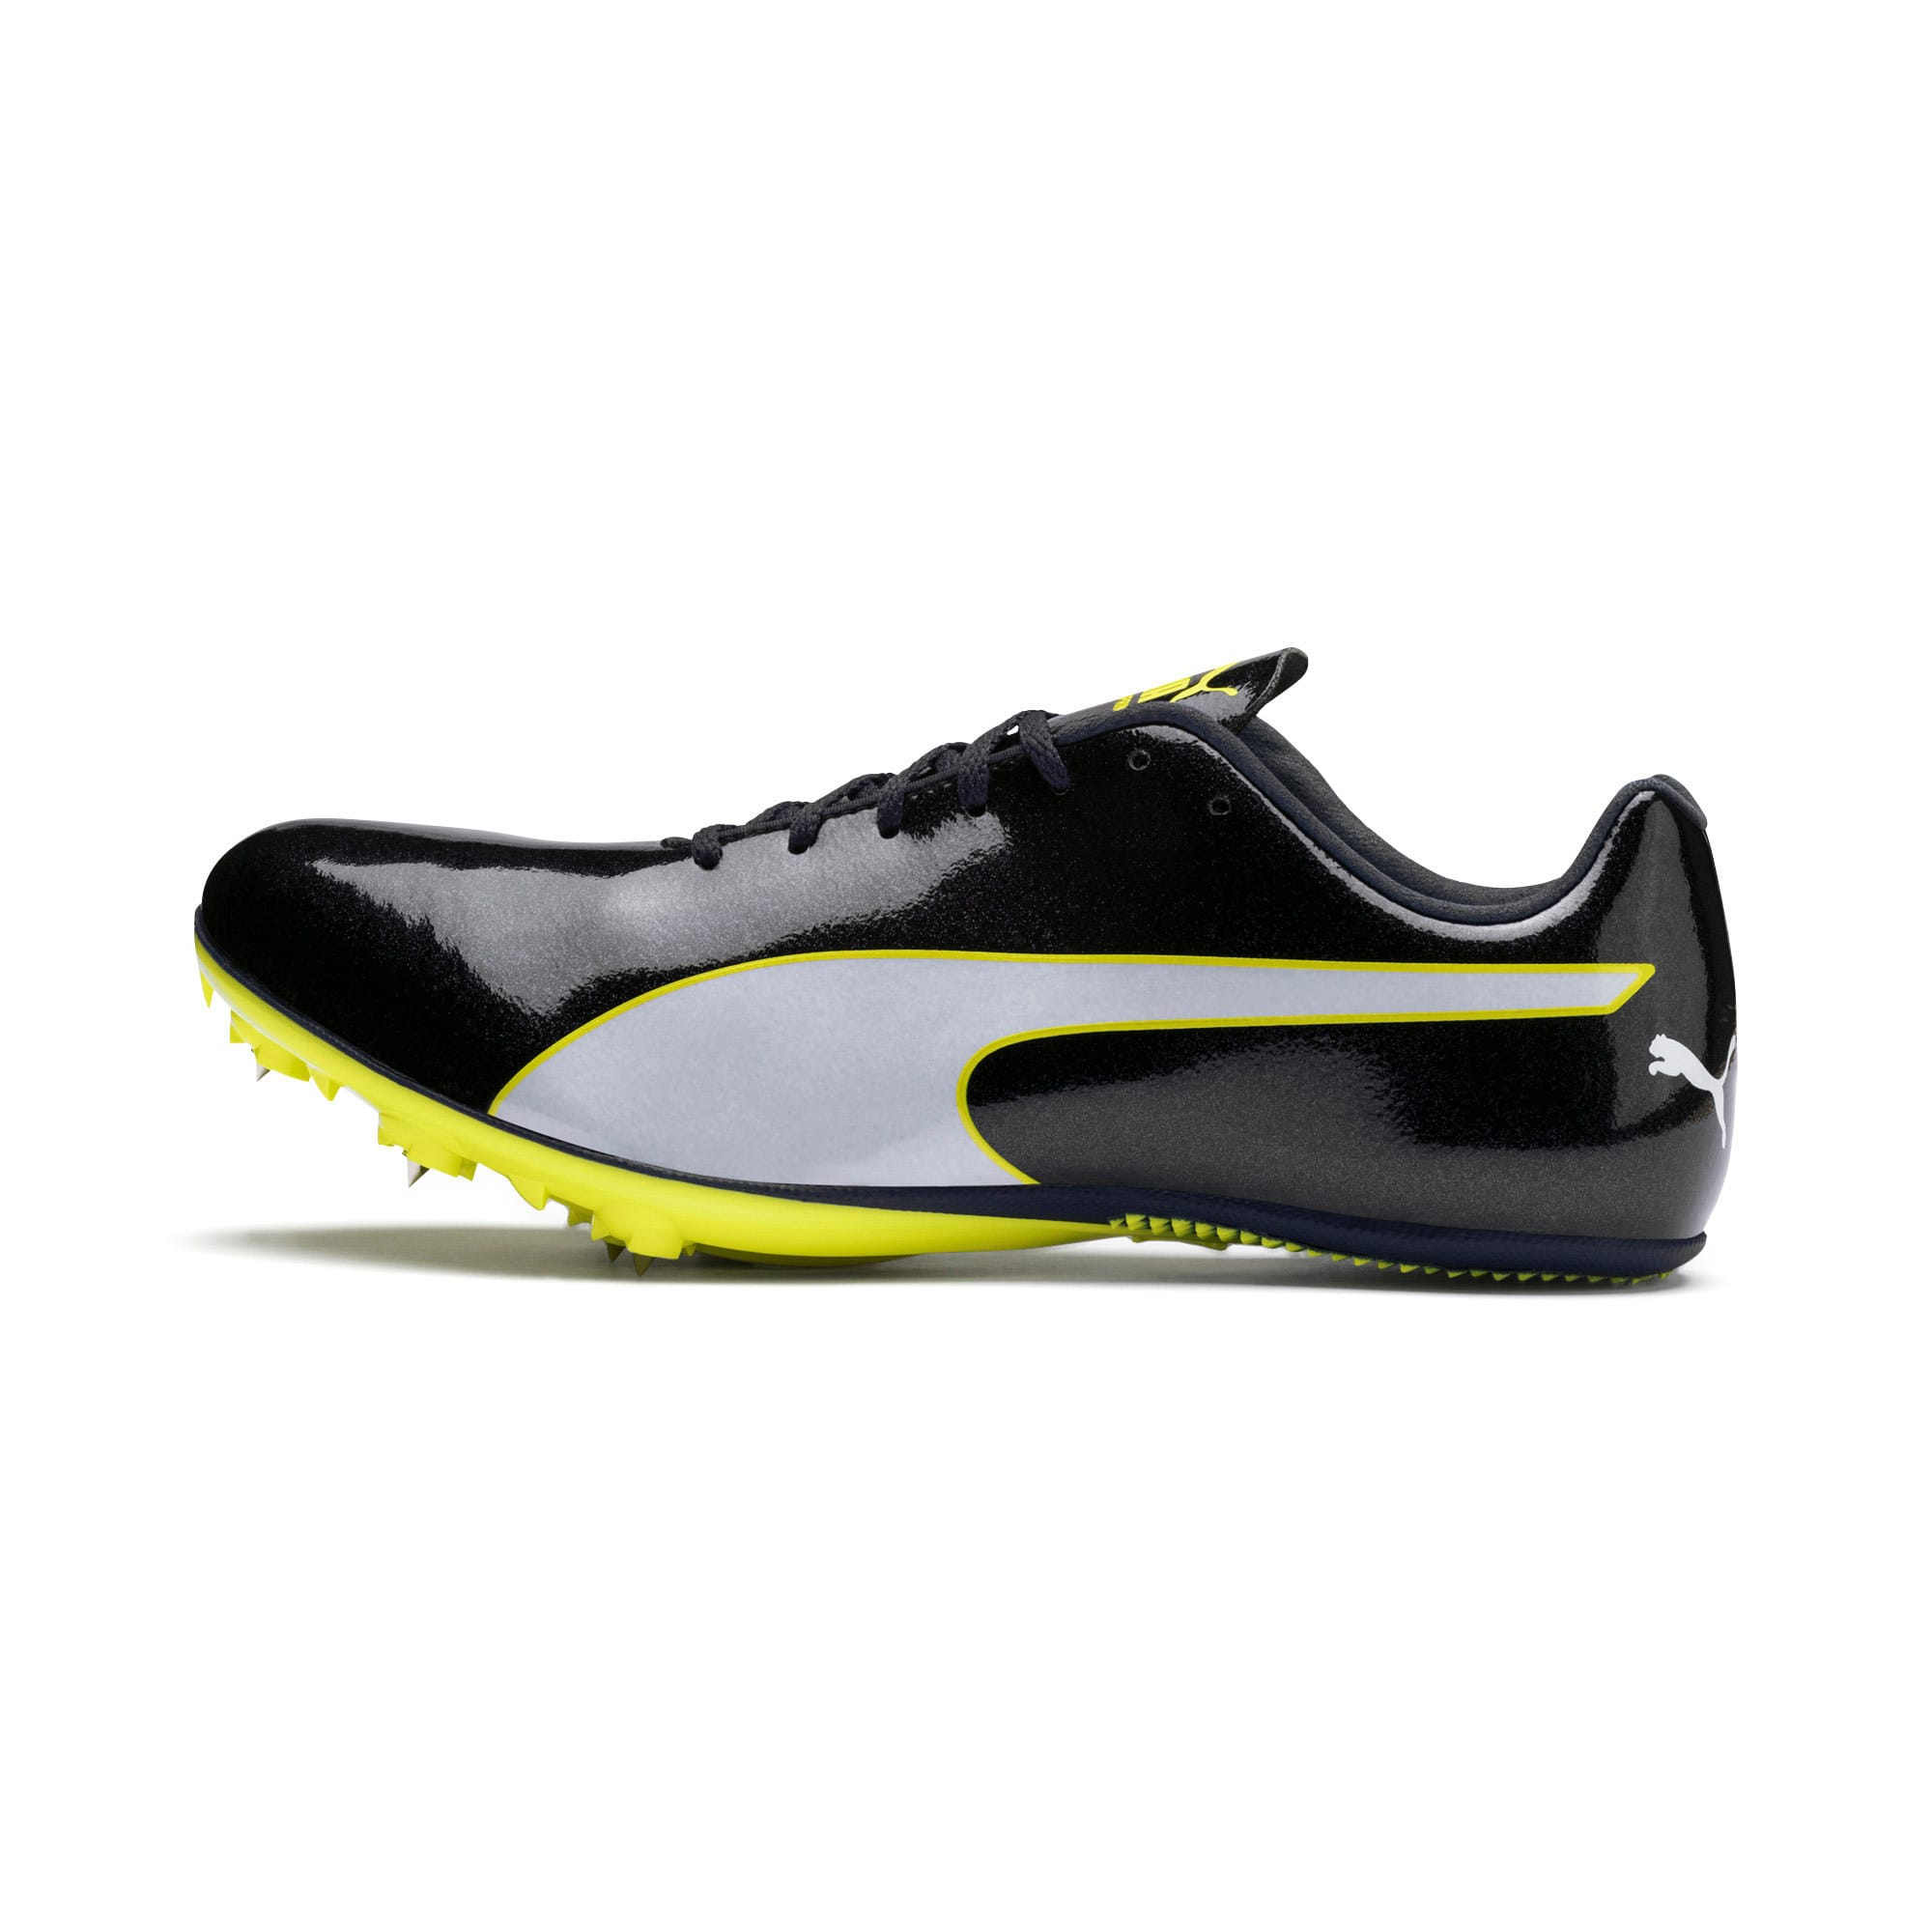 Thumbnail 1 of evoSPEED Sprint 9 Running Shoes, Black-Blazing Yellow-White, medium-IND